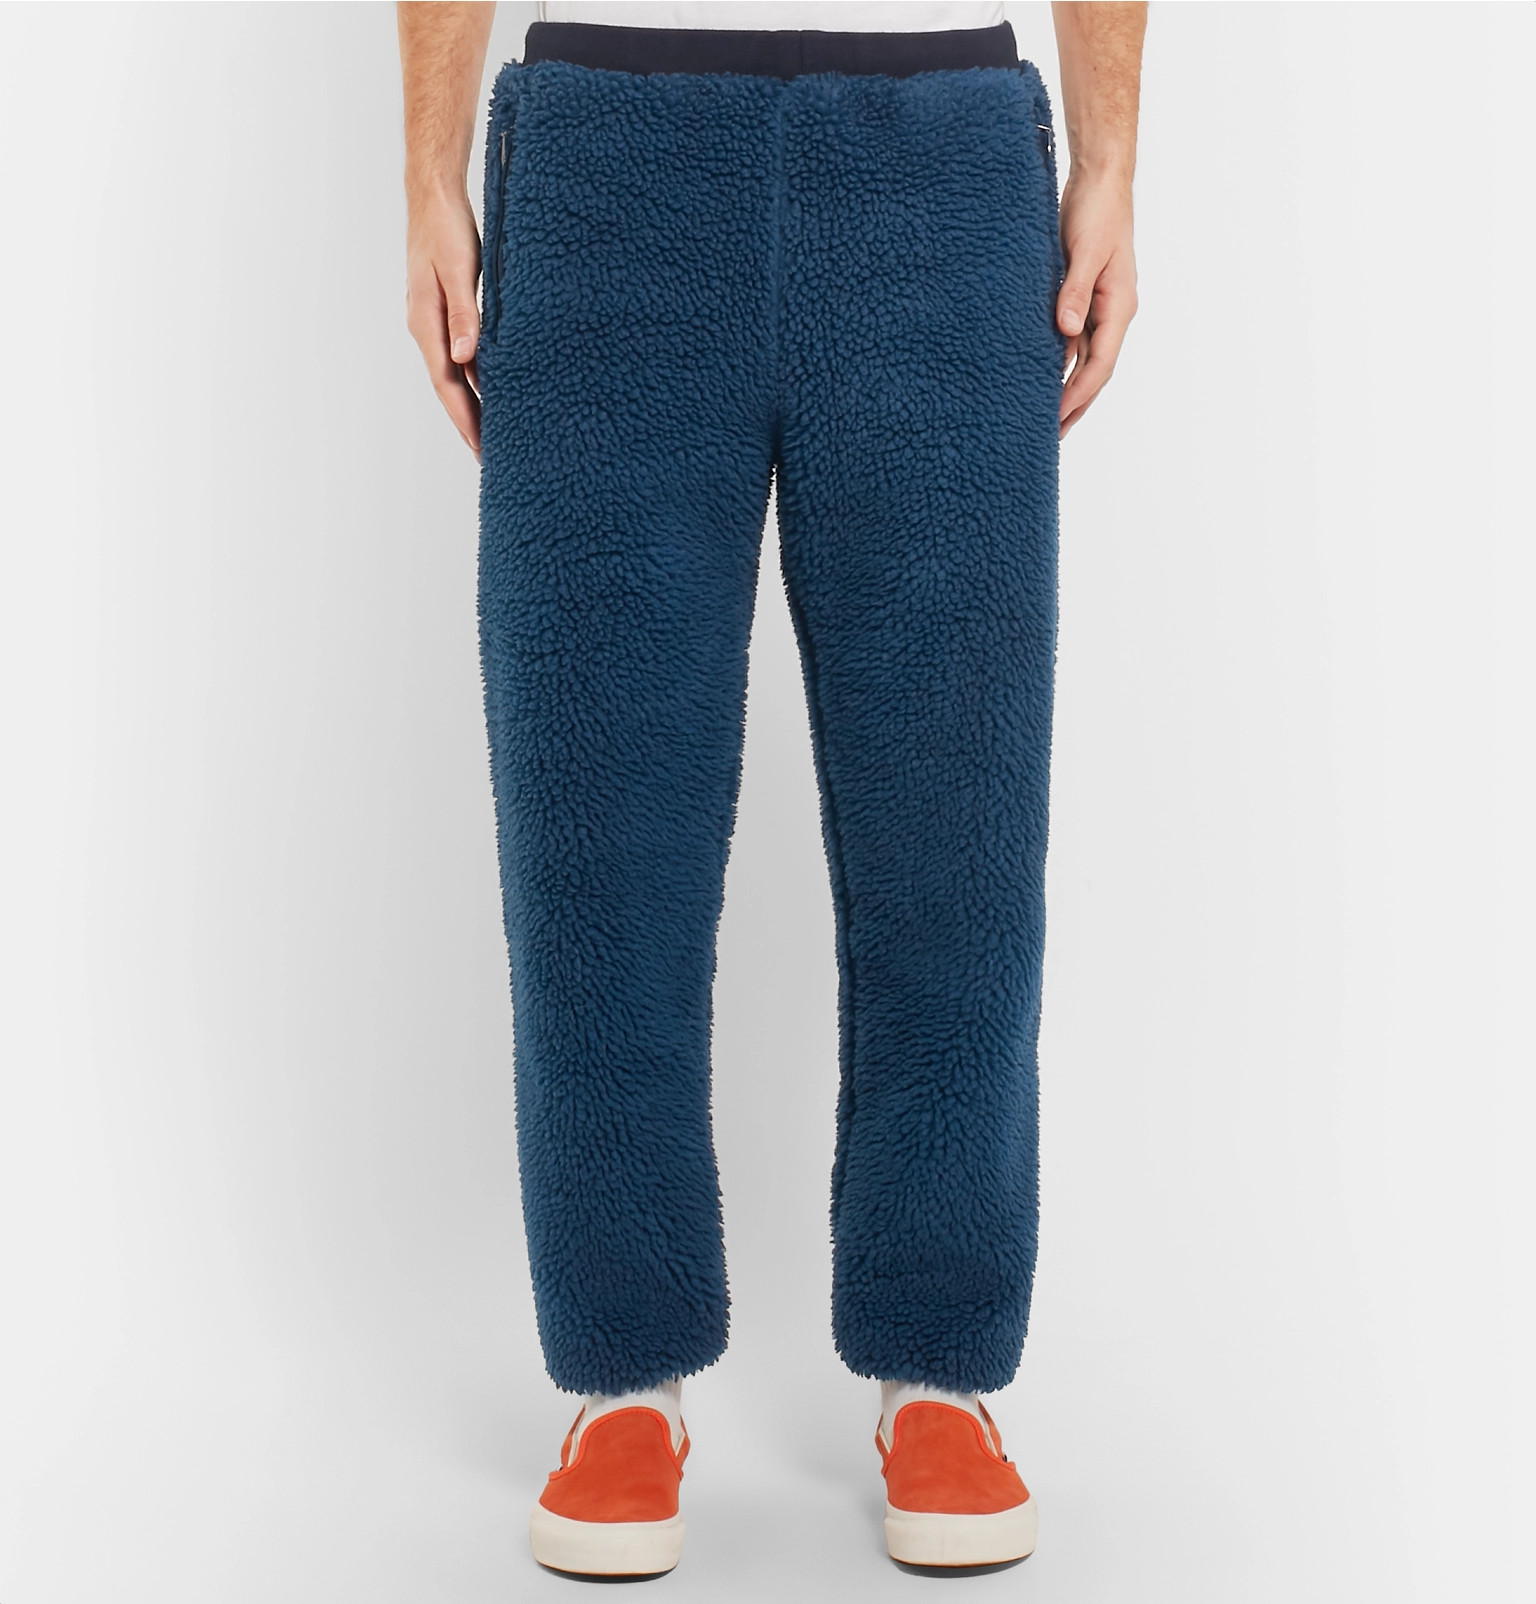 4675fadbeb9b Beams - Wide-Leg Fleece Sweatpants